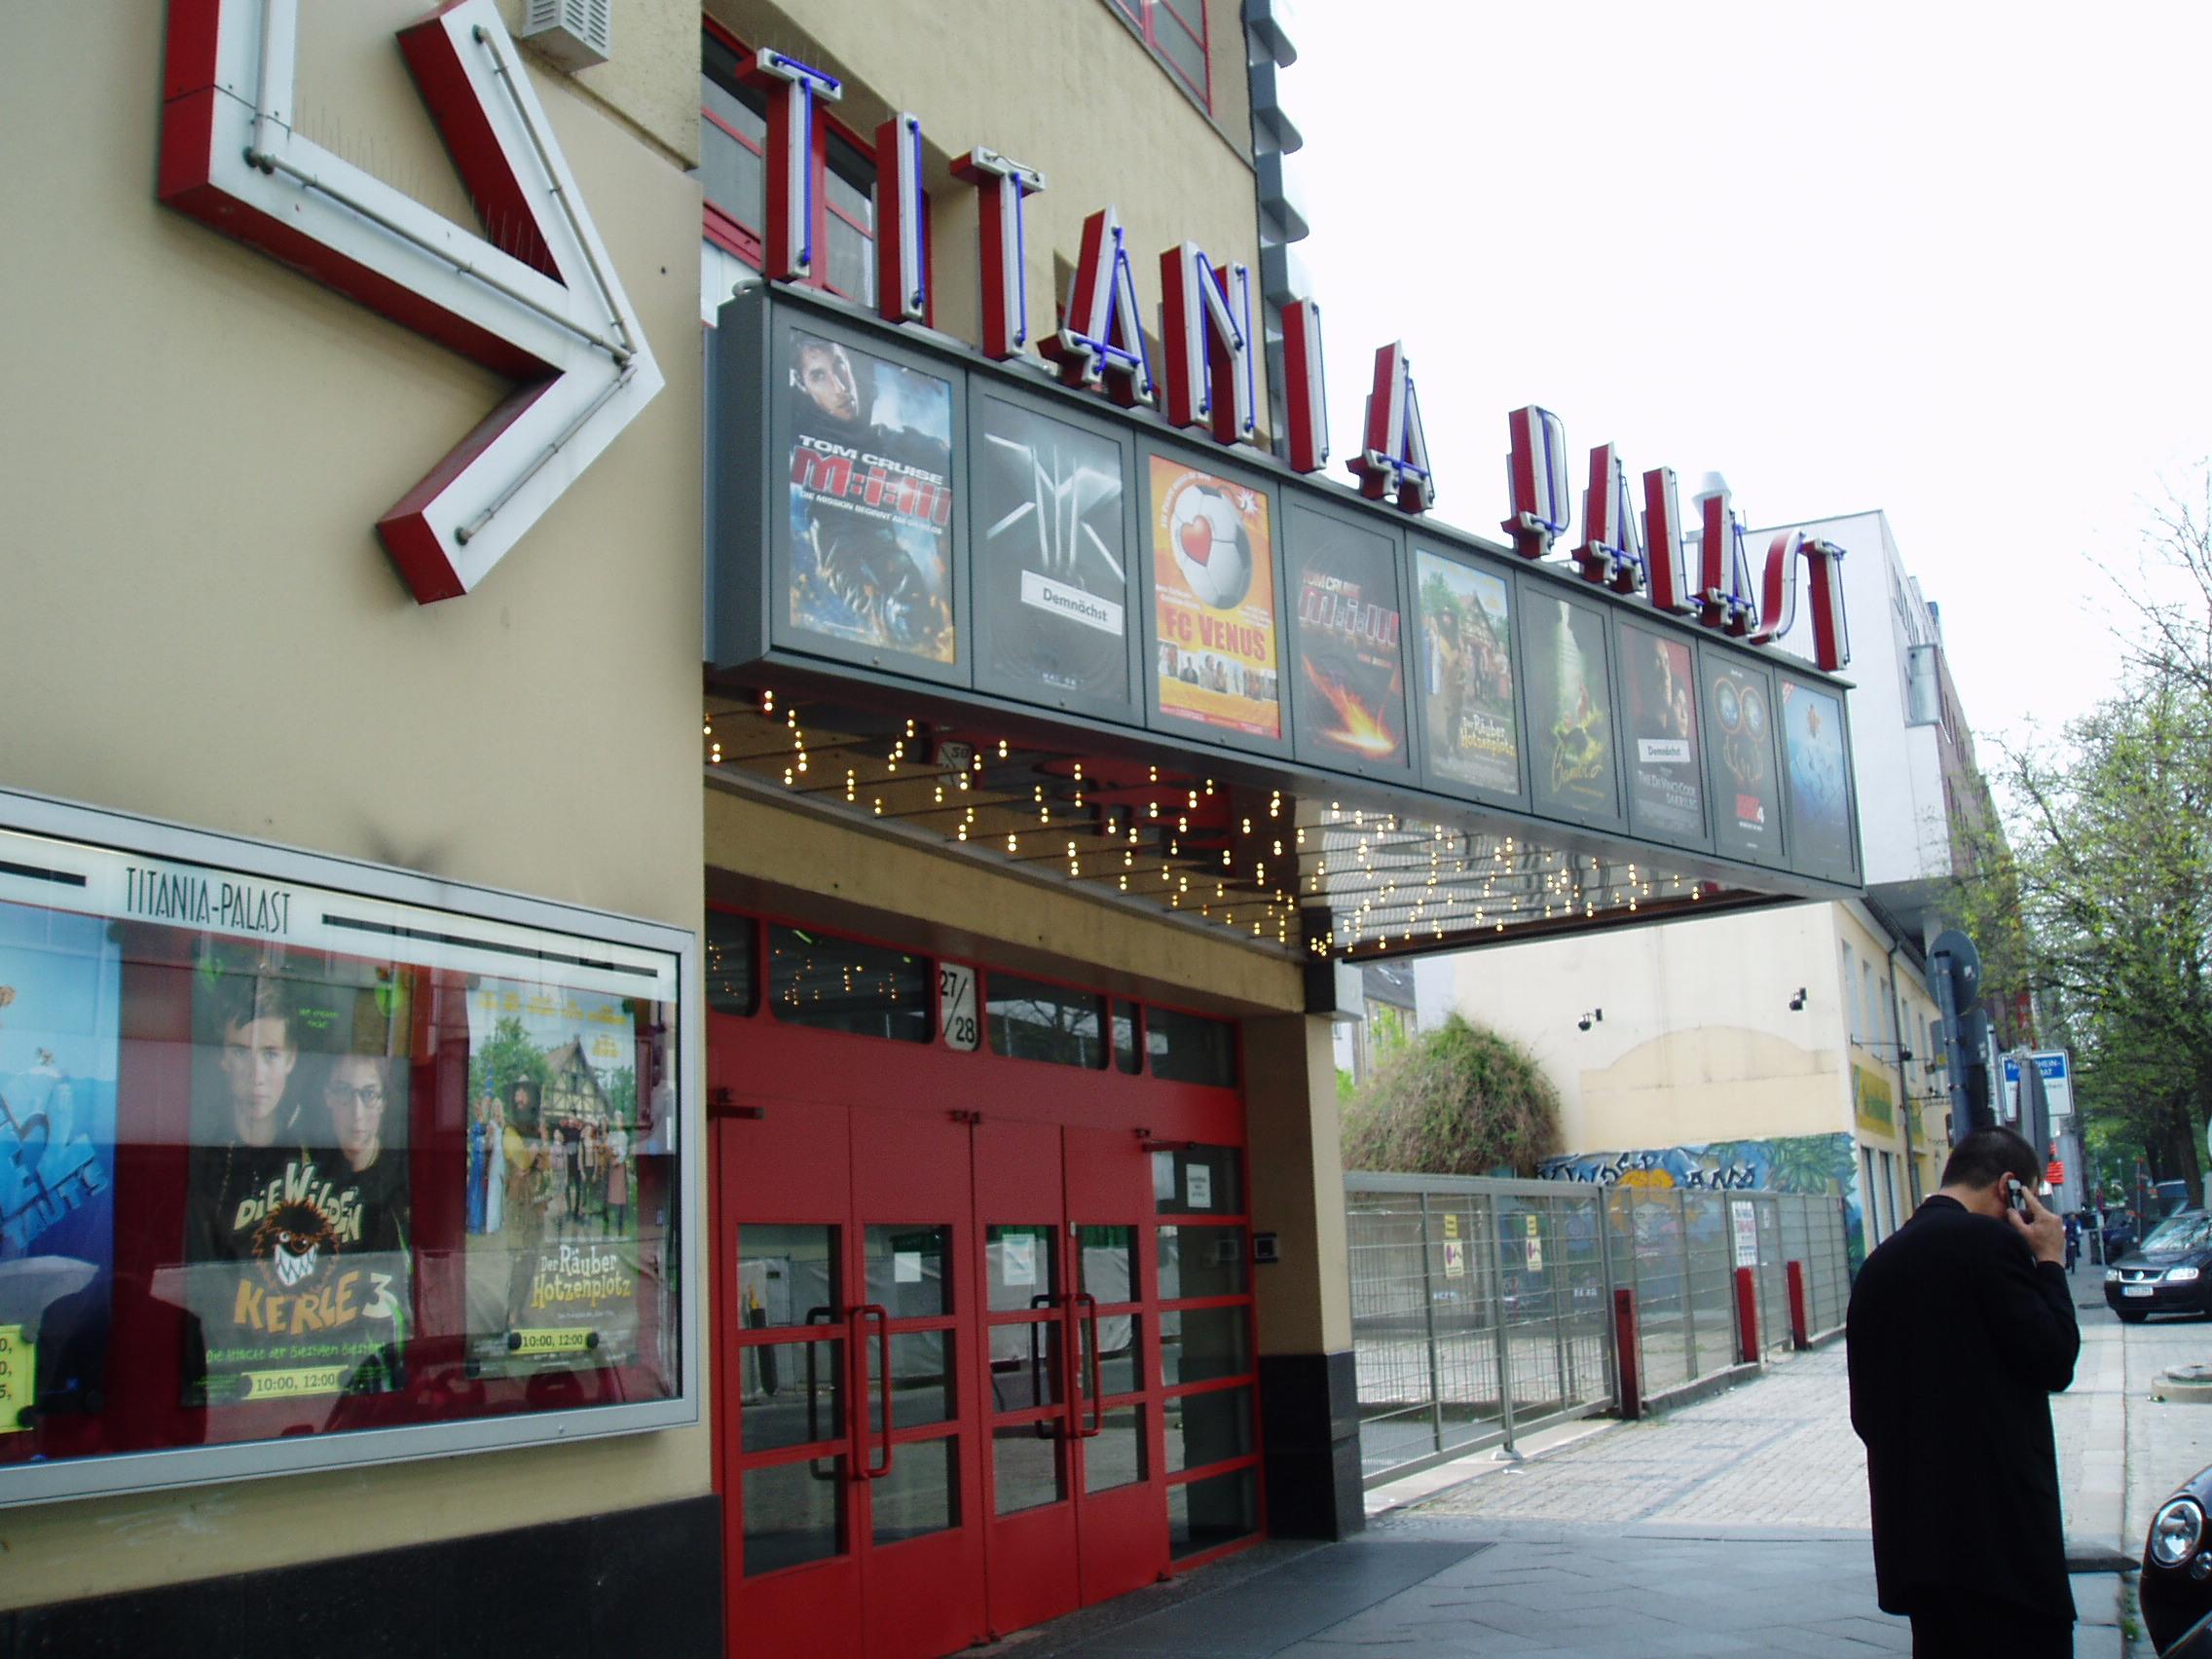 Titania Palast Steglitz Programm Heute